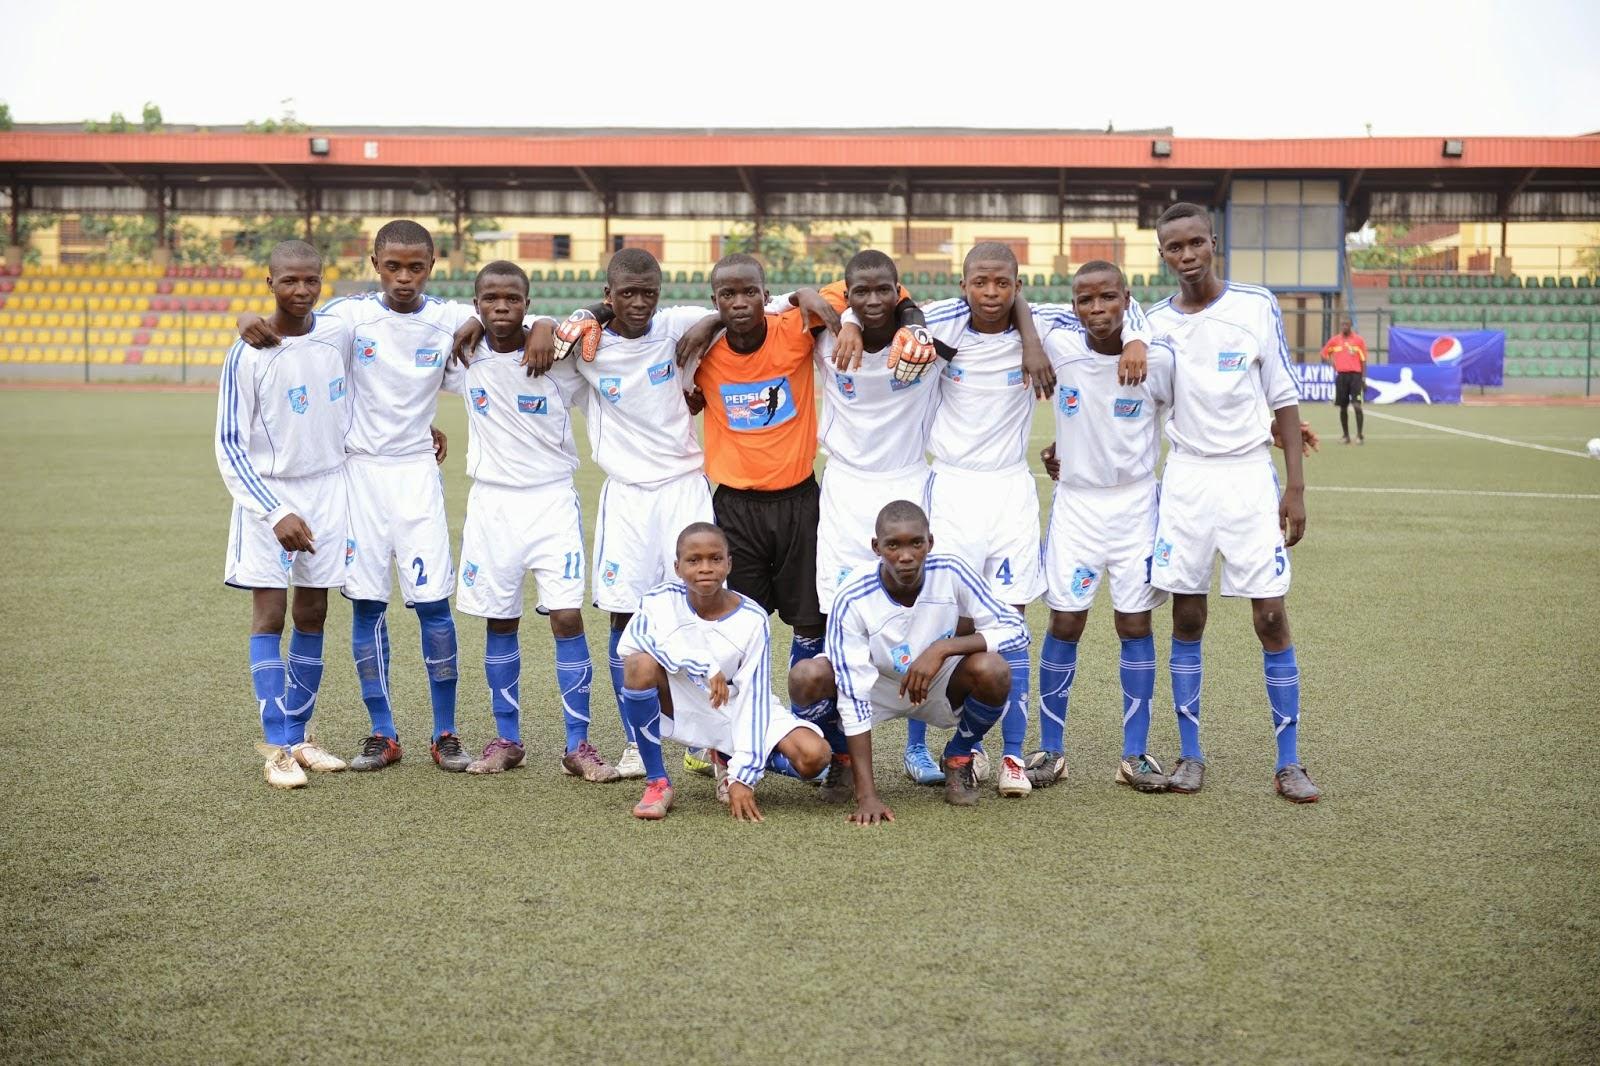 10 World Class Football Academies In Nigeria Developing Future Stars Cheer On Nigeria